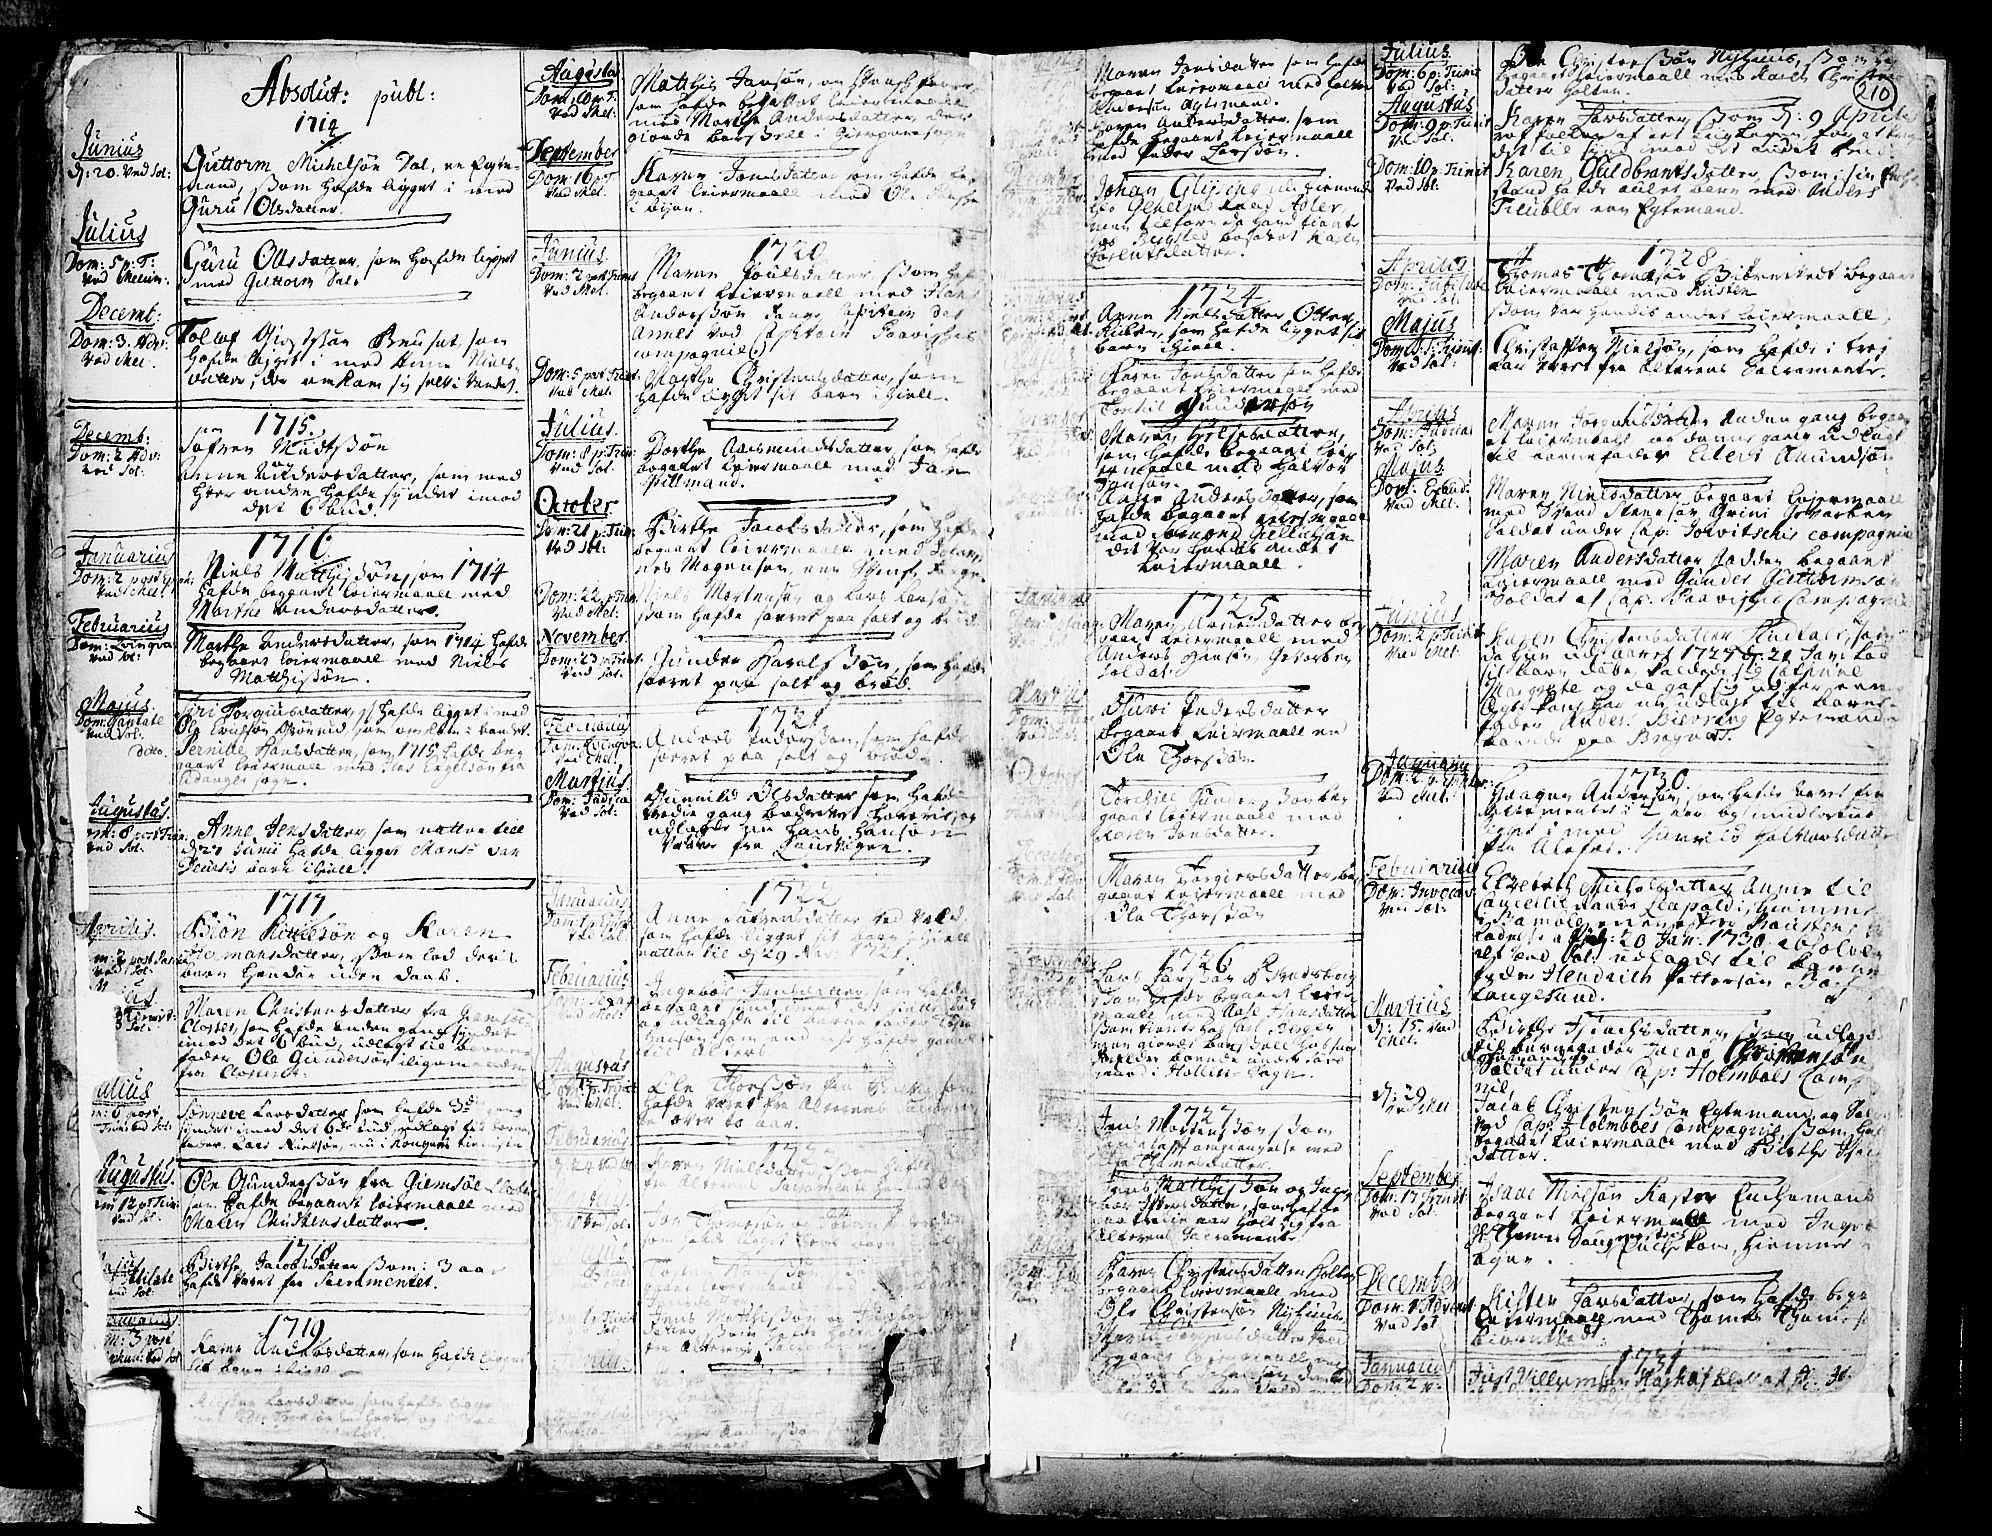 SAKO, Solum kirkebøker, F/Fa/L0002: Ministerialbok nr. I 2, 1713-1761, s. 210